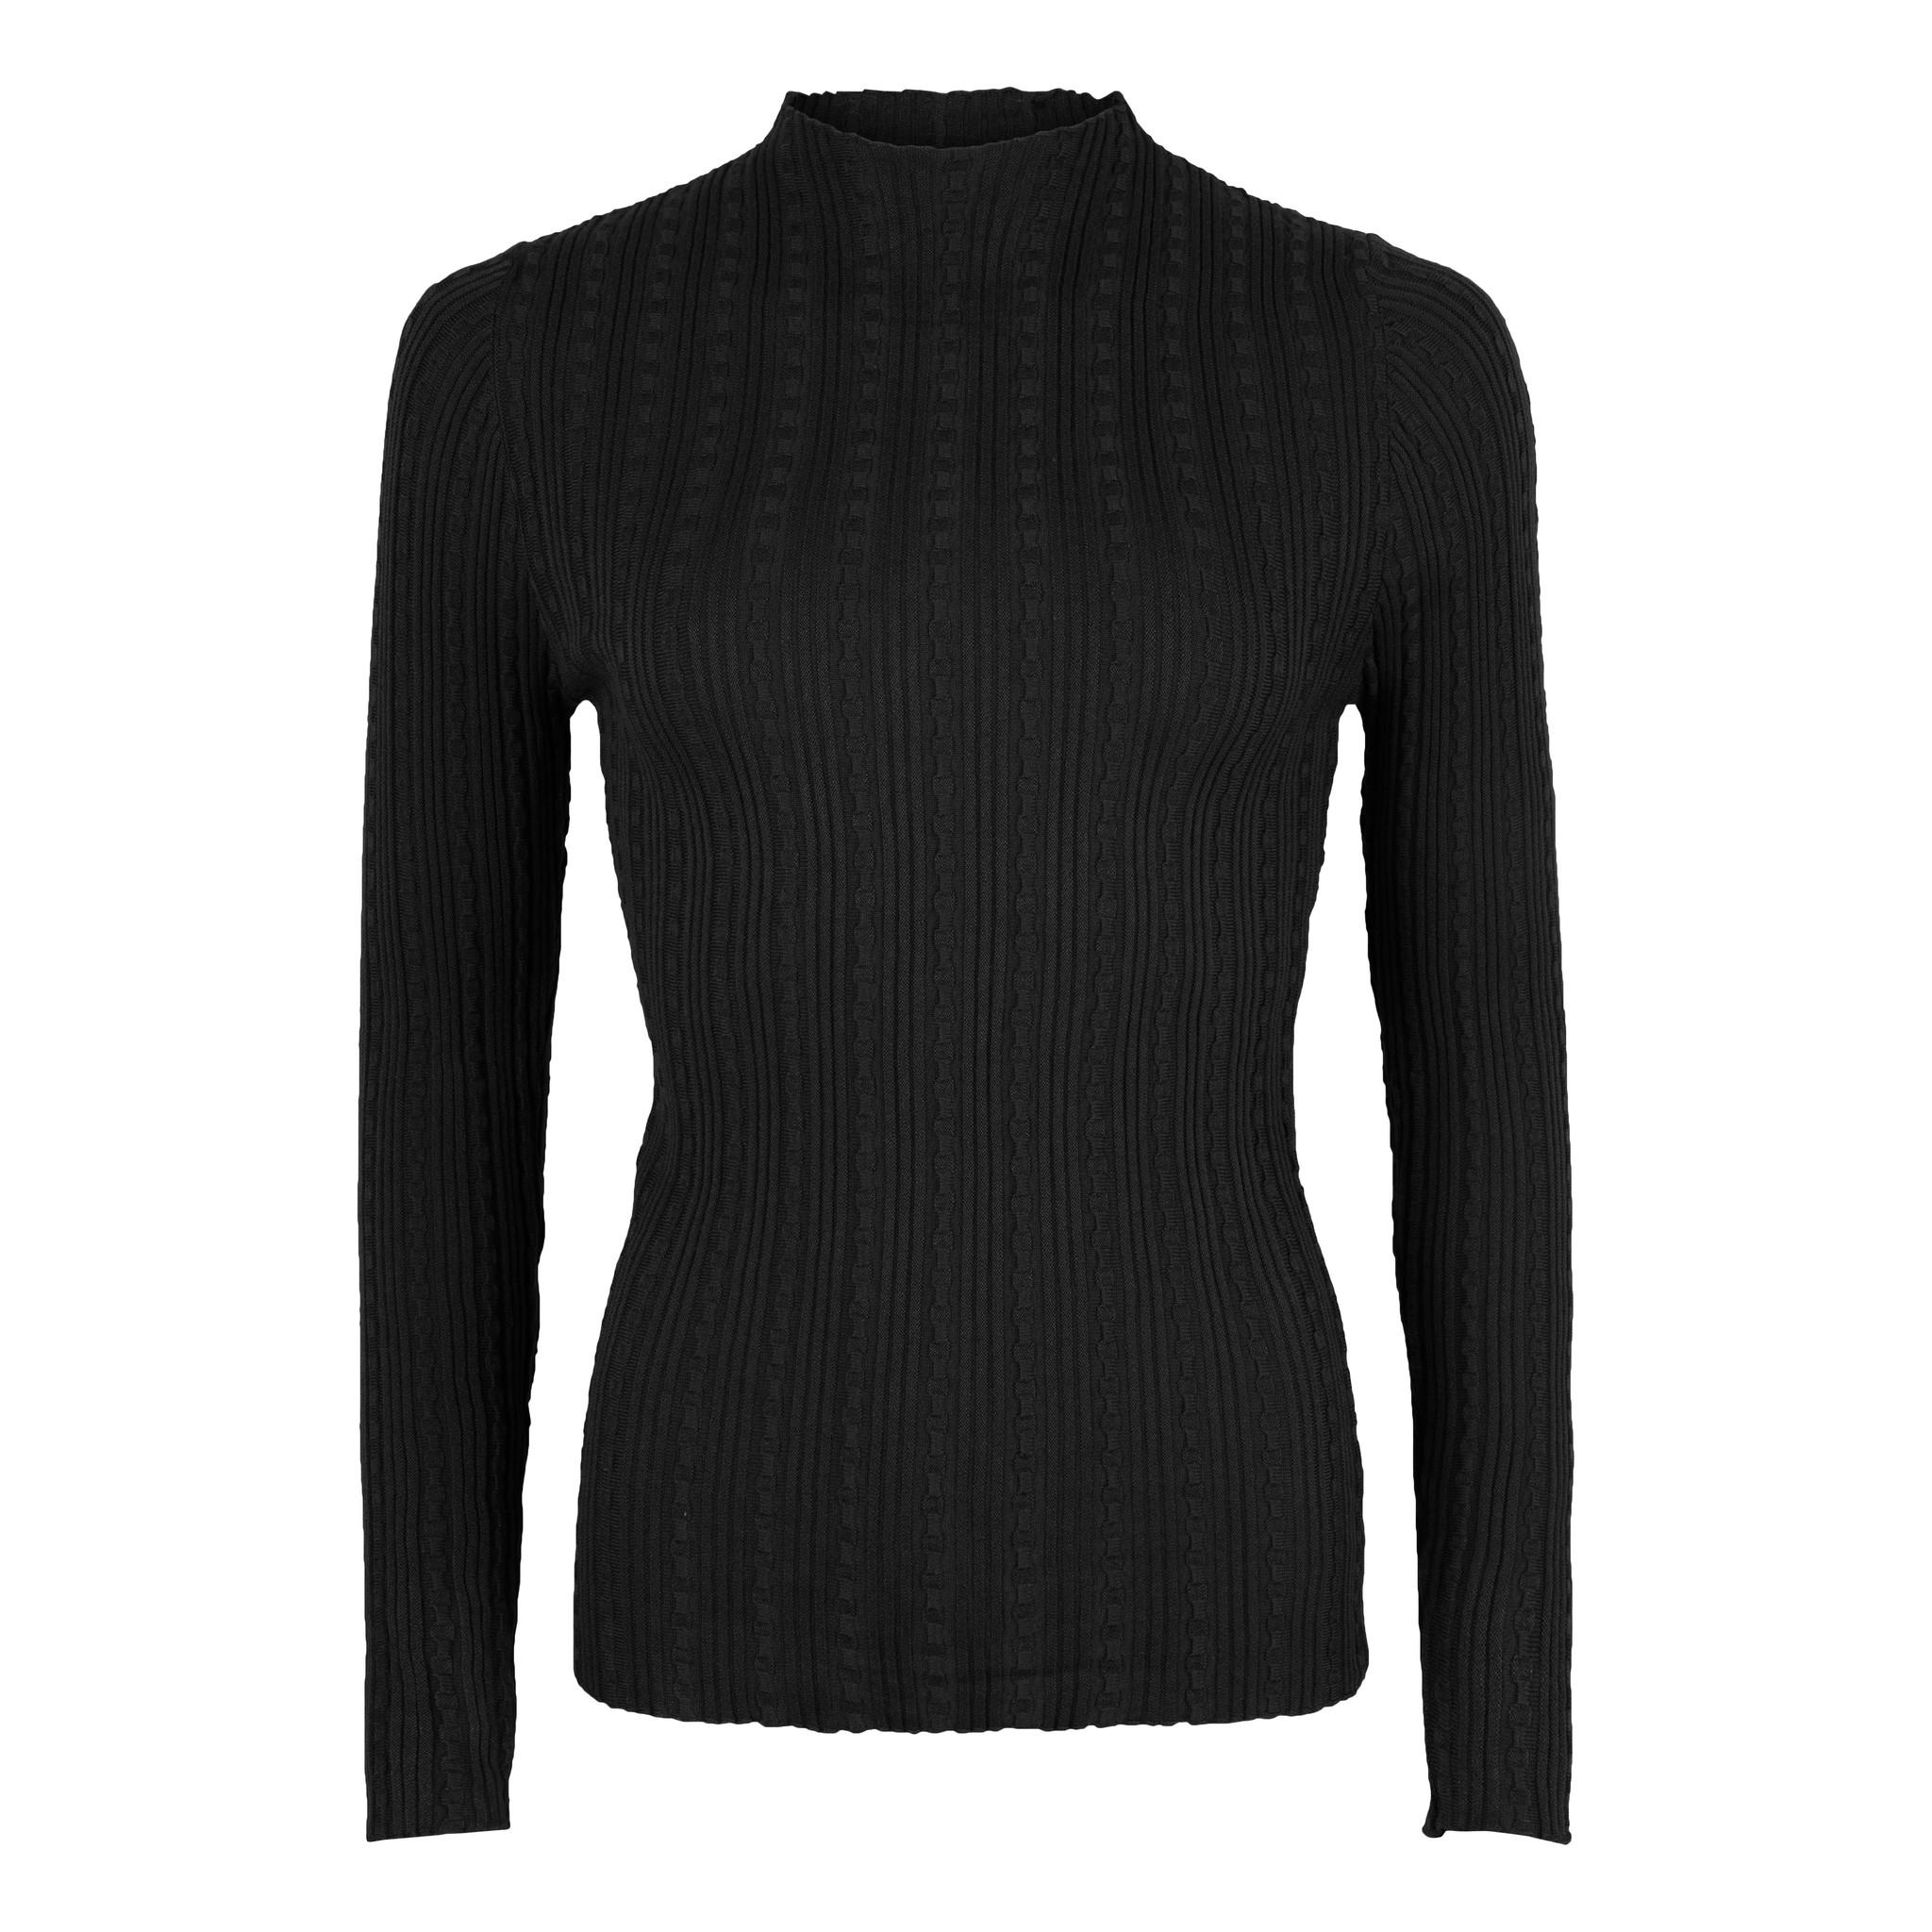 Lofty Manner Black Sweater Carmo